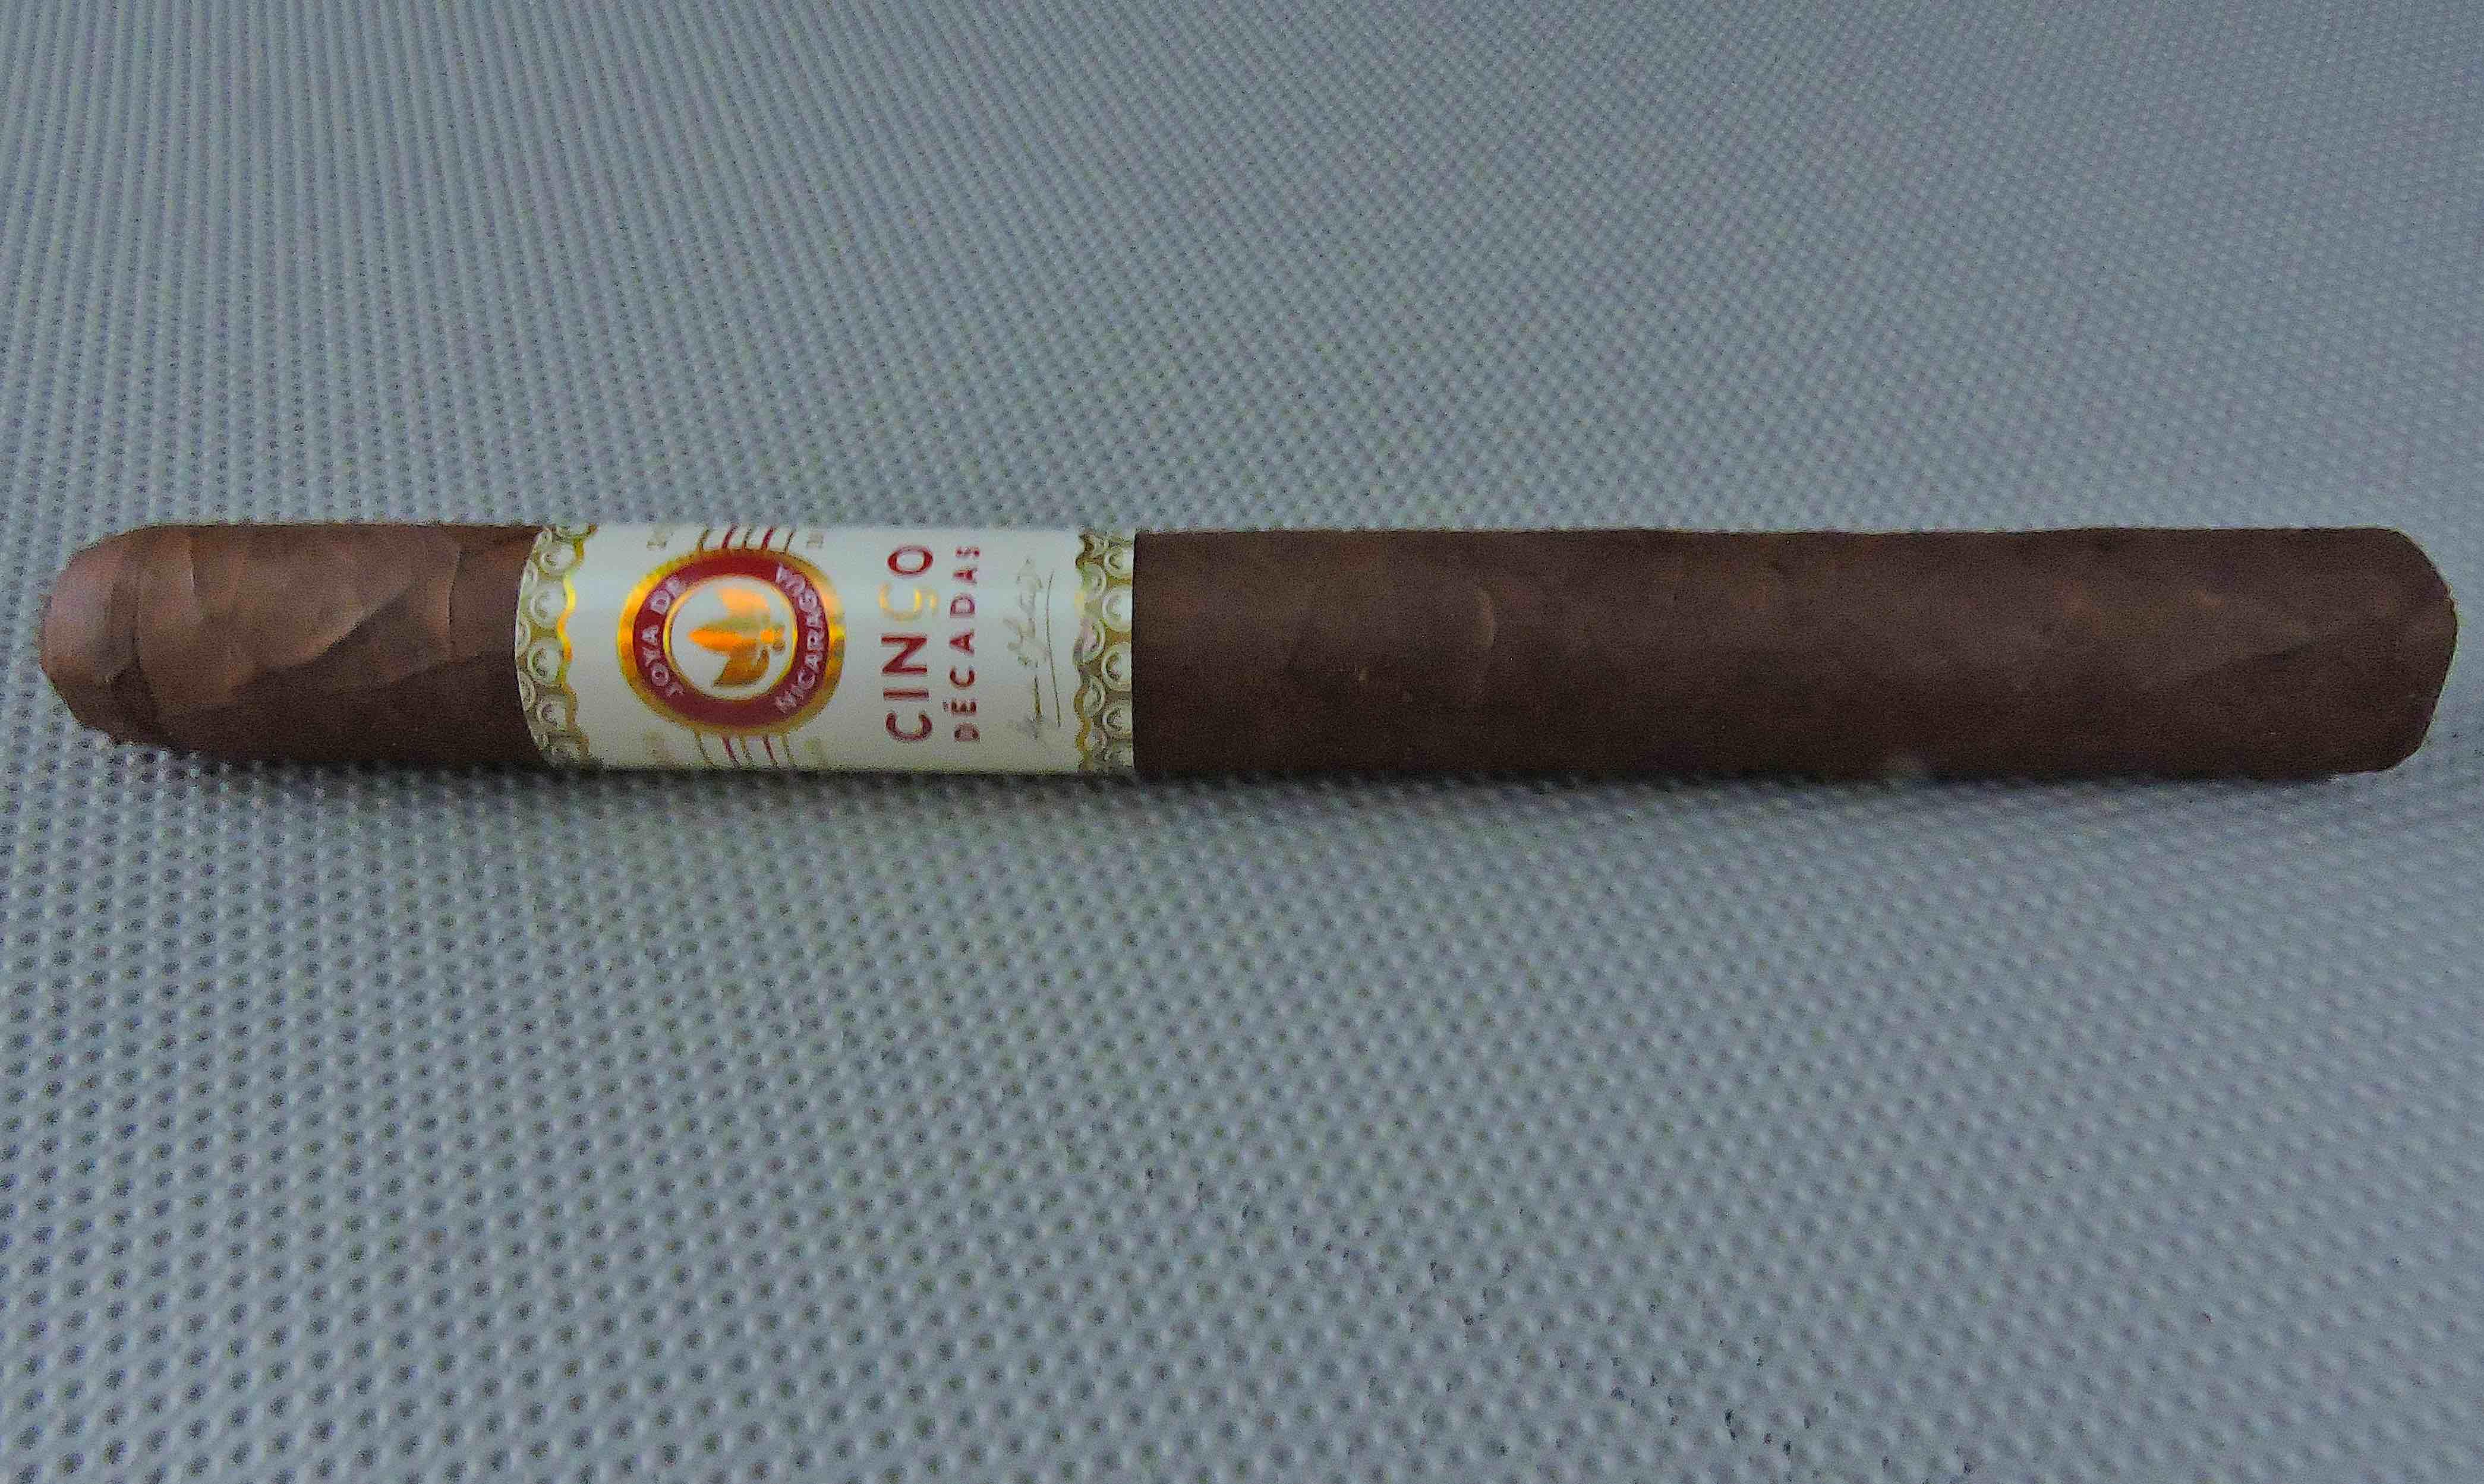 Cigar Review: Joya de Nicaragua Cinco Décadas El General